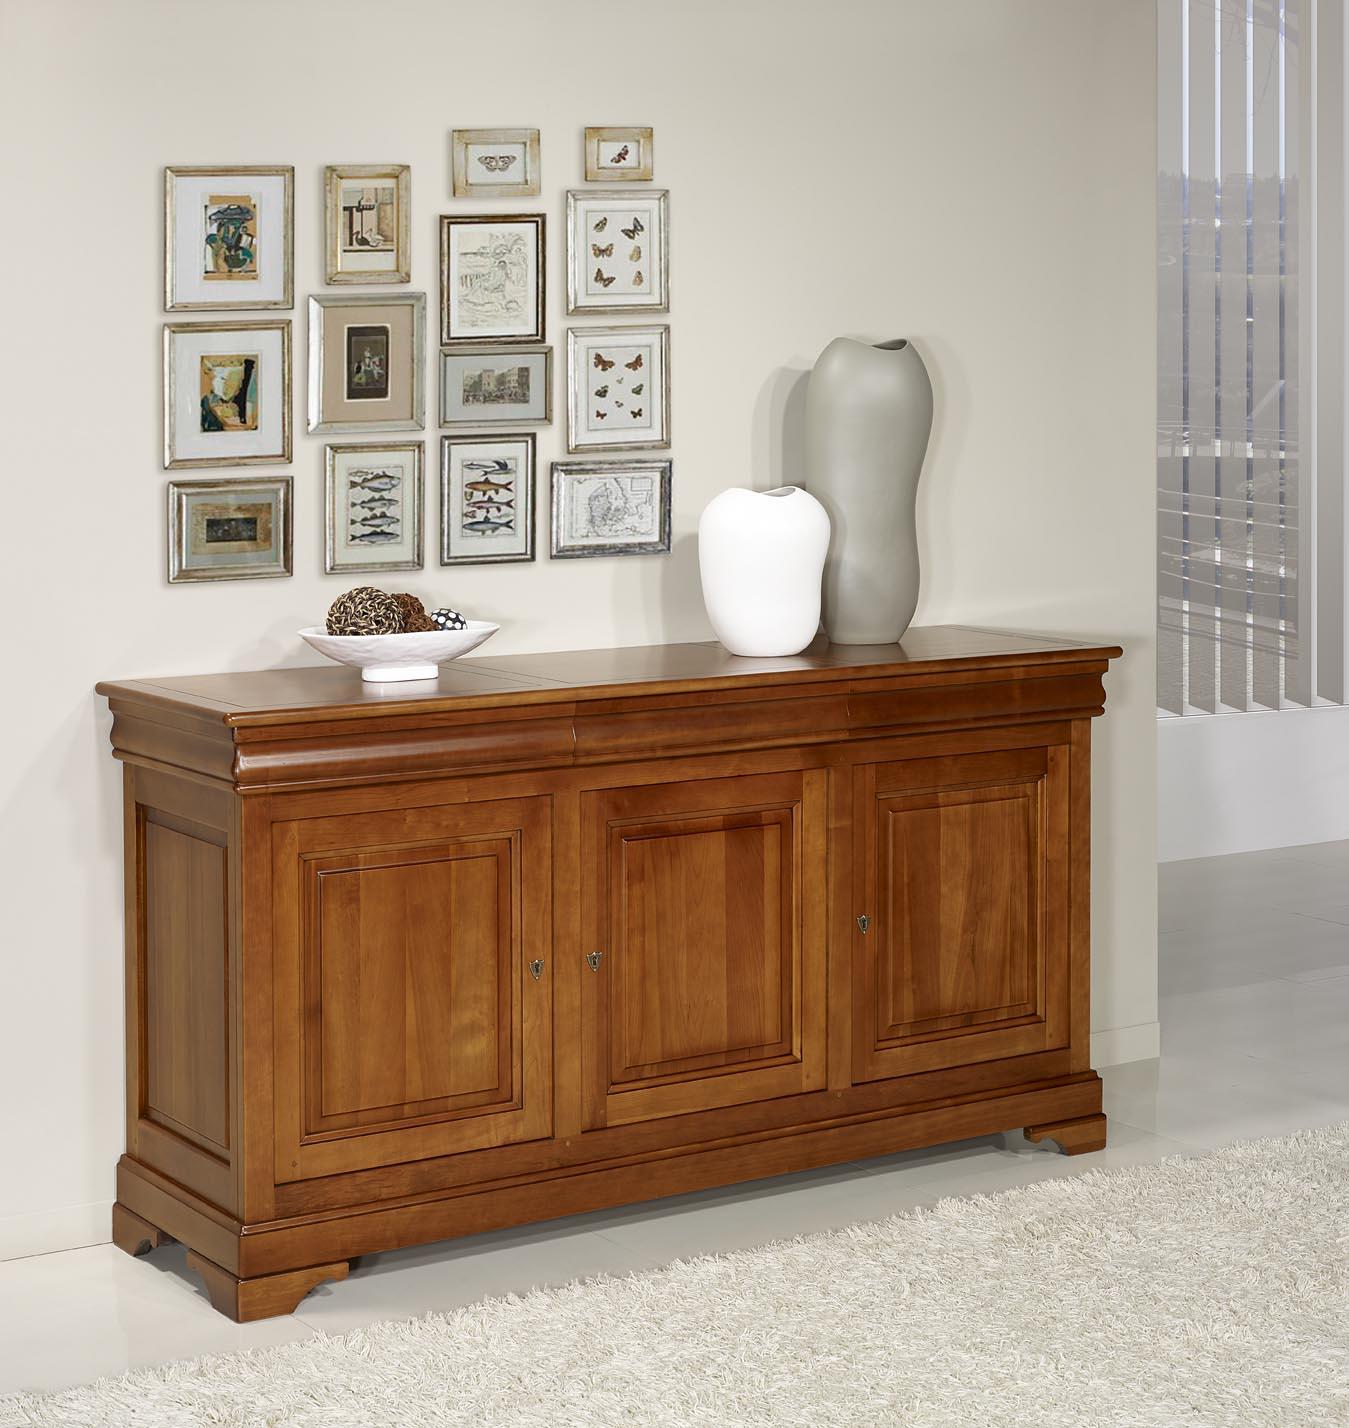 Buffet 3 portes 3 tiroirs en merisier massif de style louis philippe meuble en merisier massif - Petit meuble merisier louis philippe ...